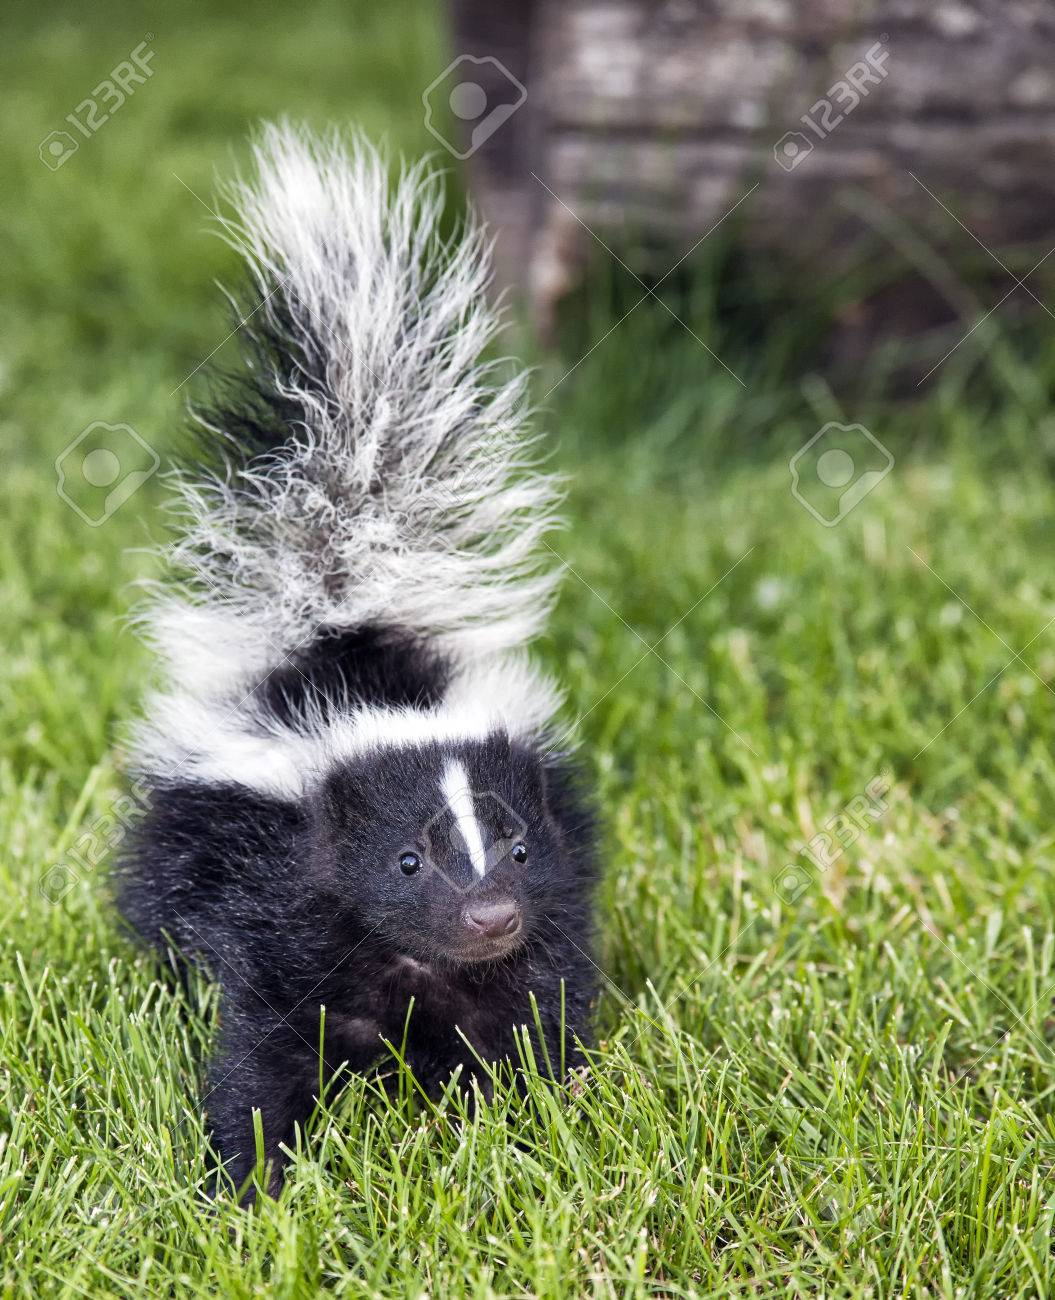 playground-closeup-picture-of-skunk-kendra-bridget